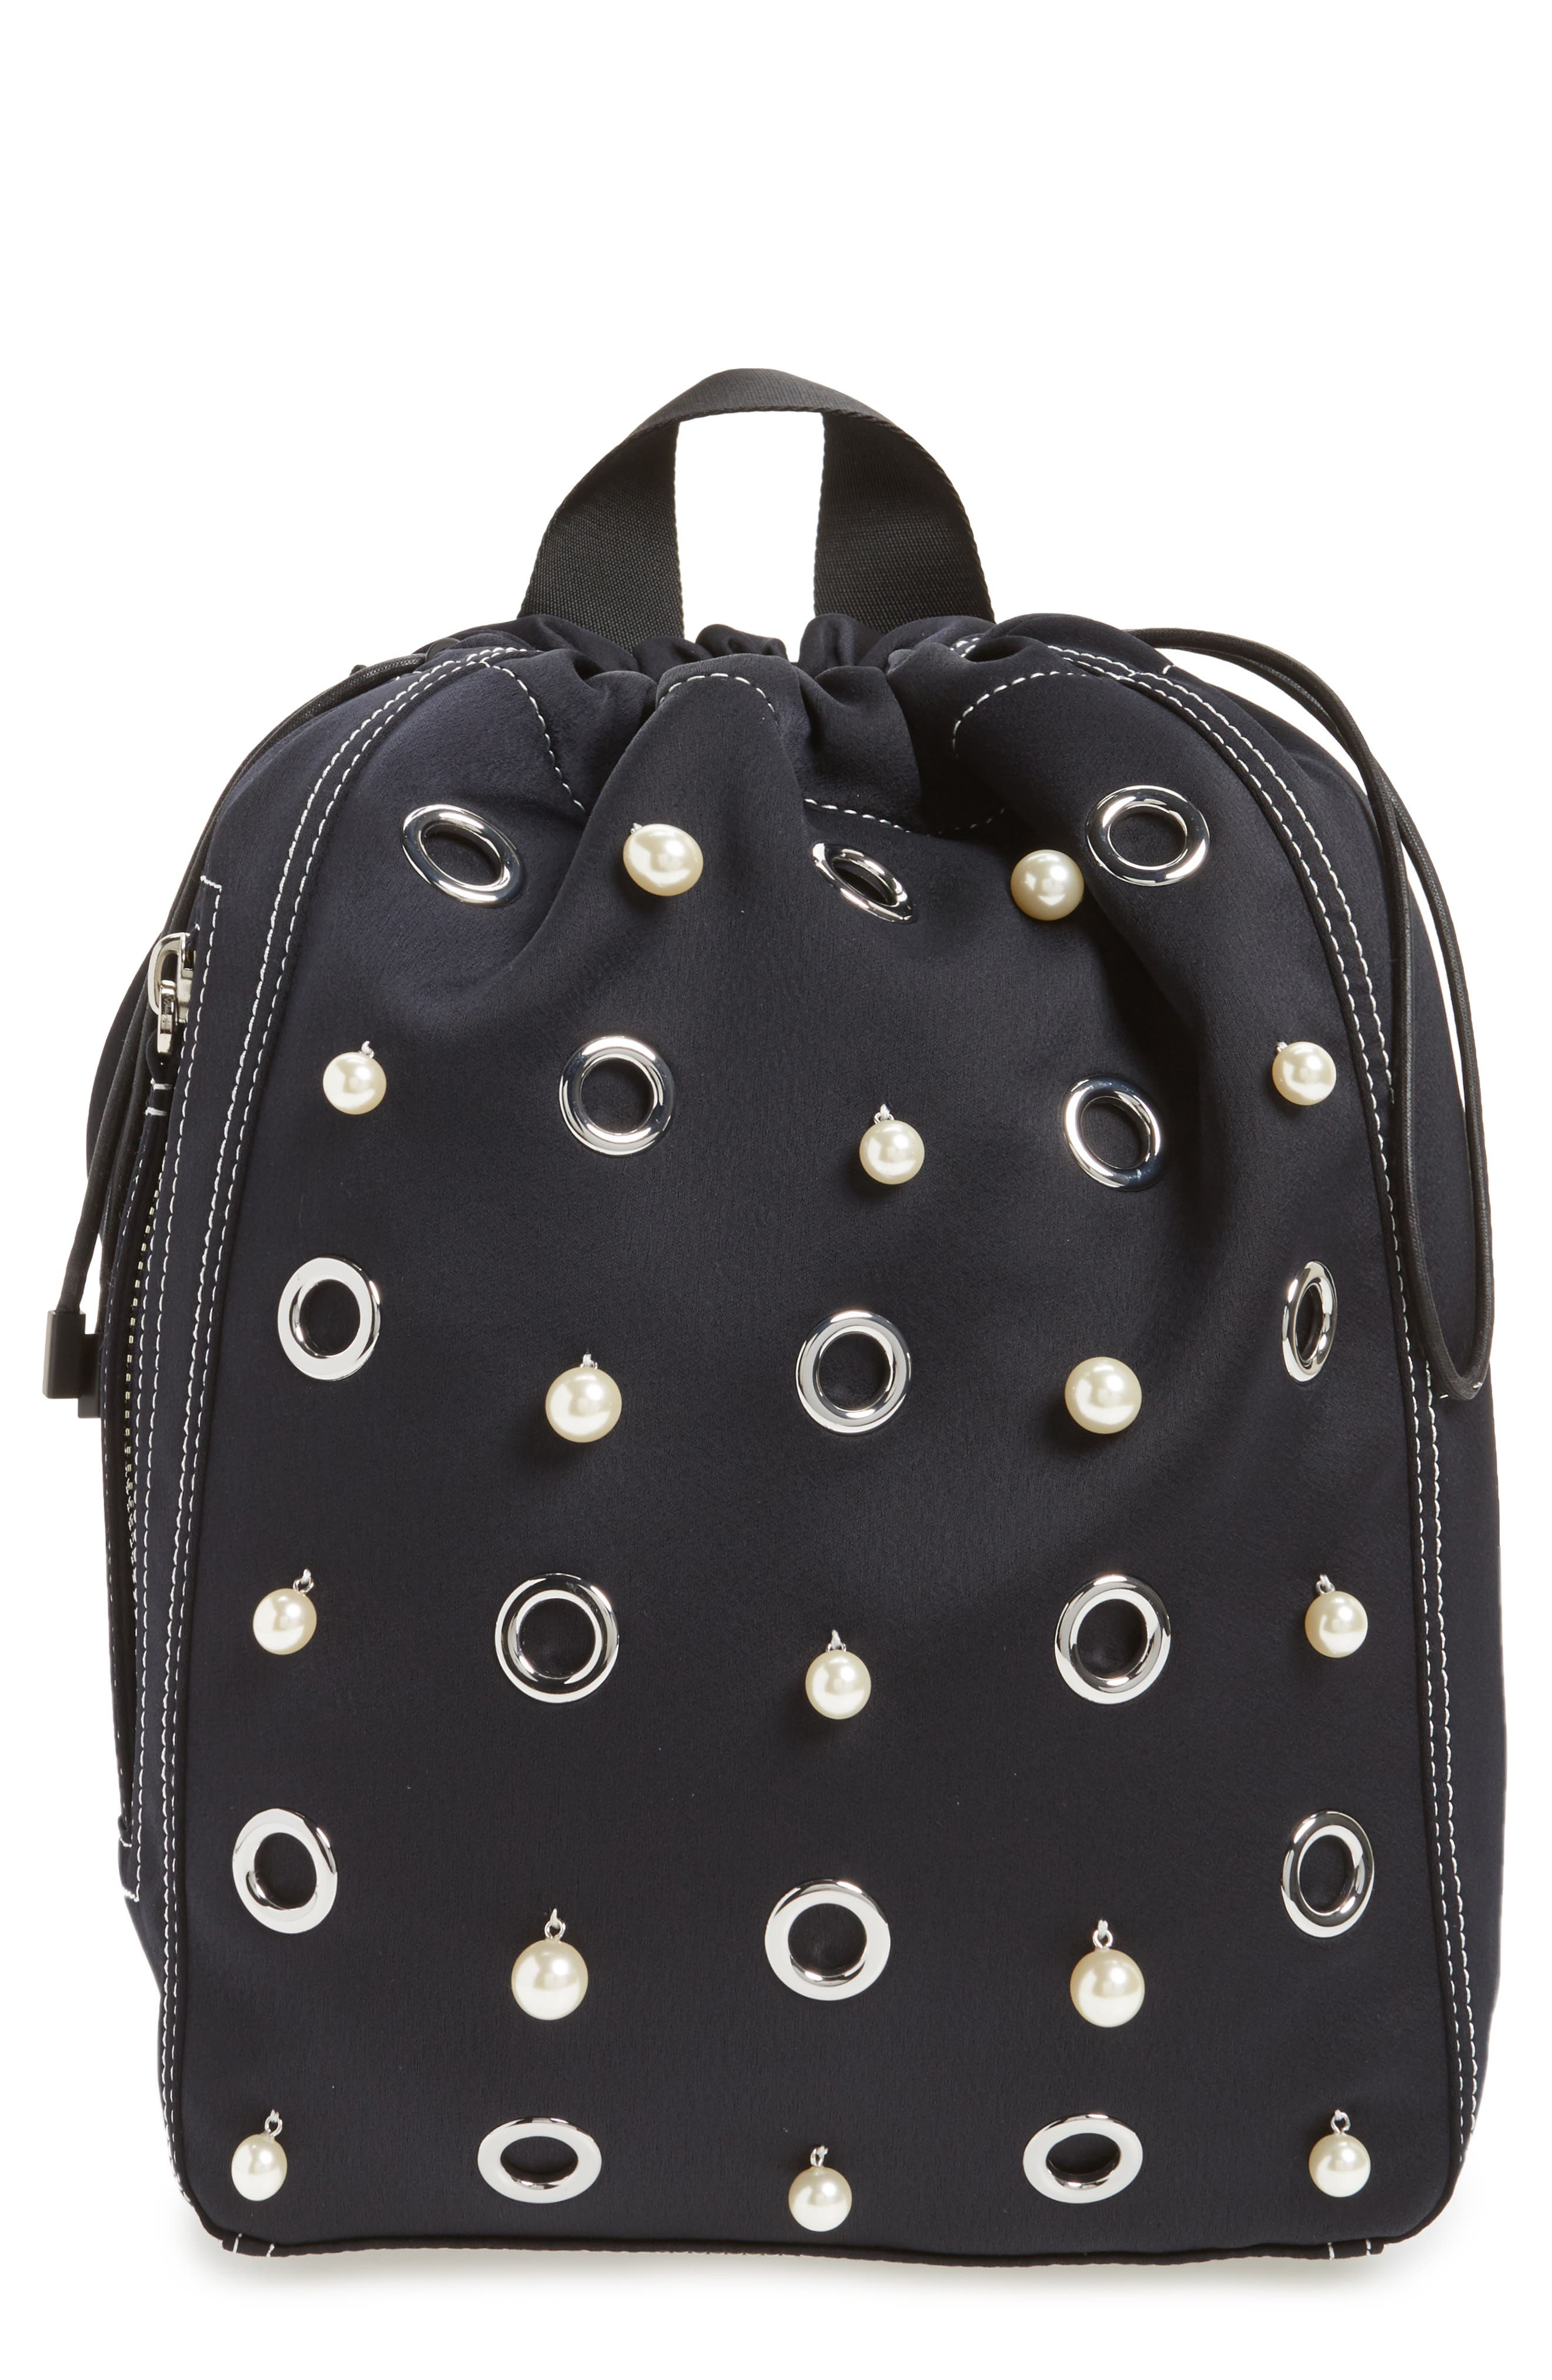 Main Image - Phillip Lim 3.1 Medium Go-Go Embellished Backpack